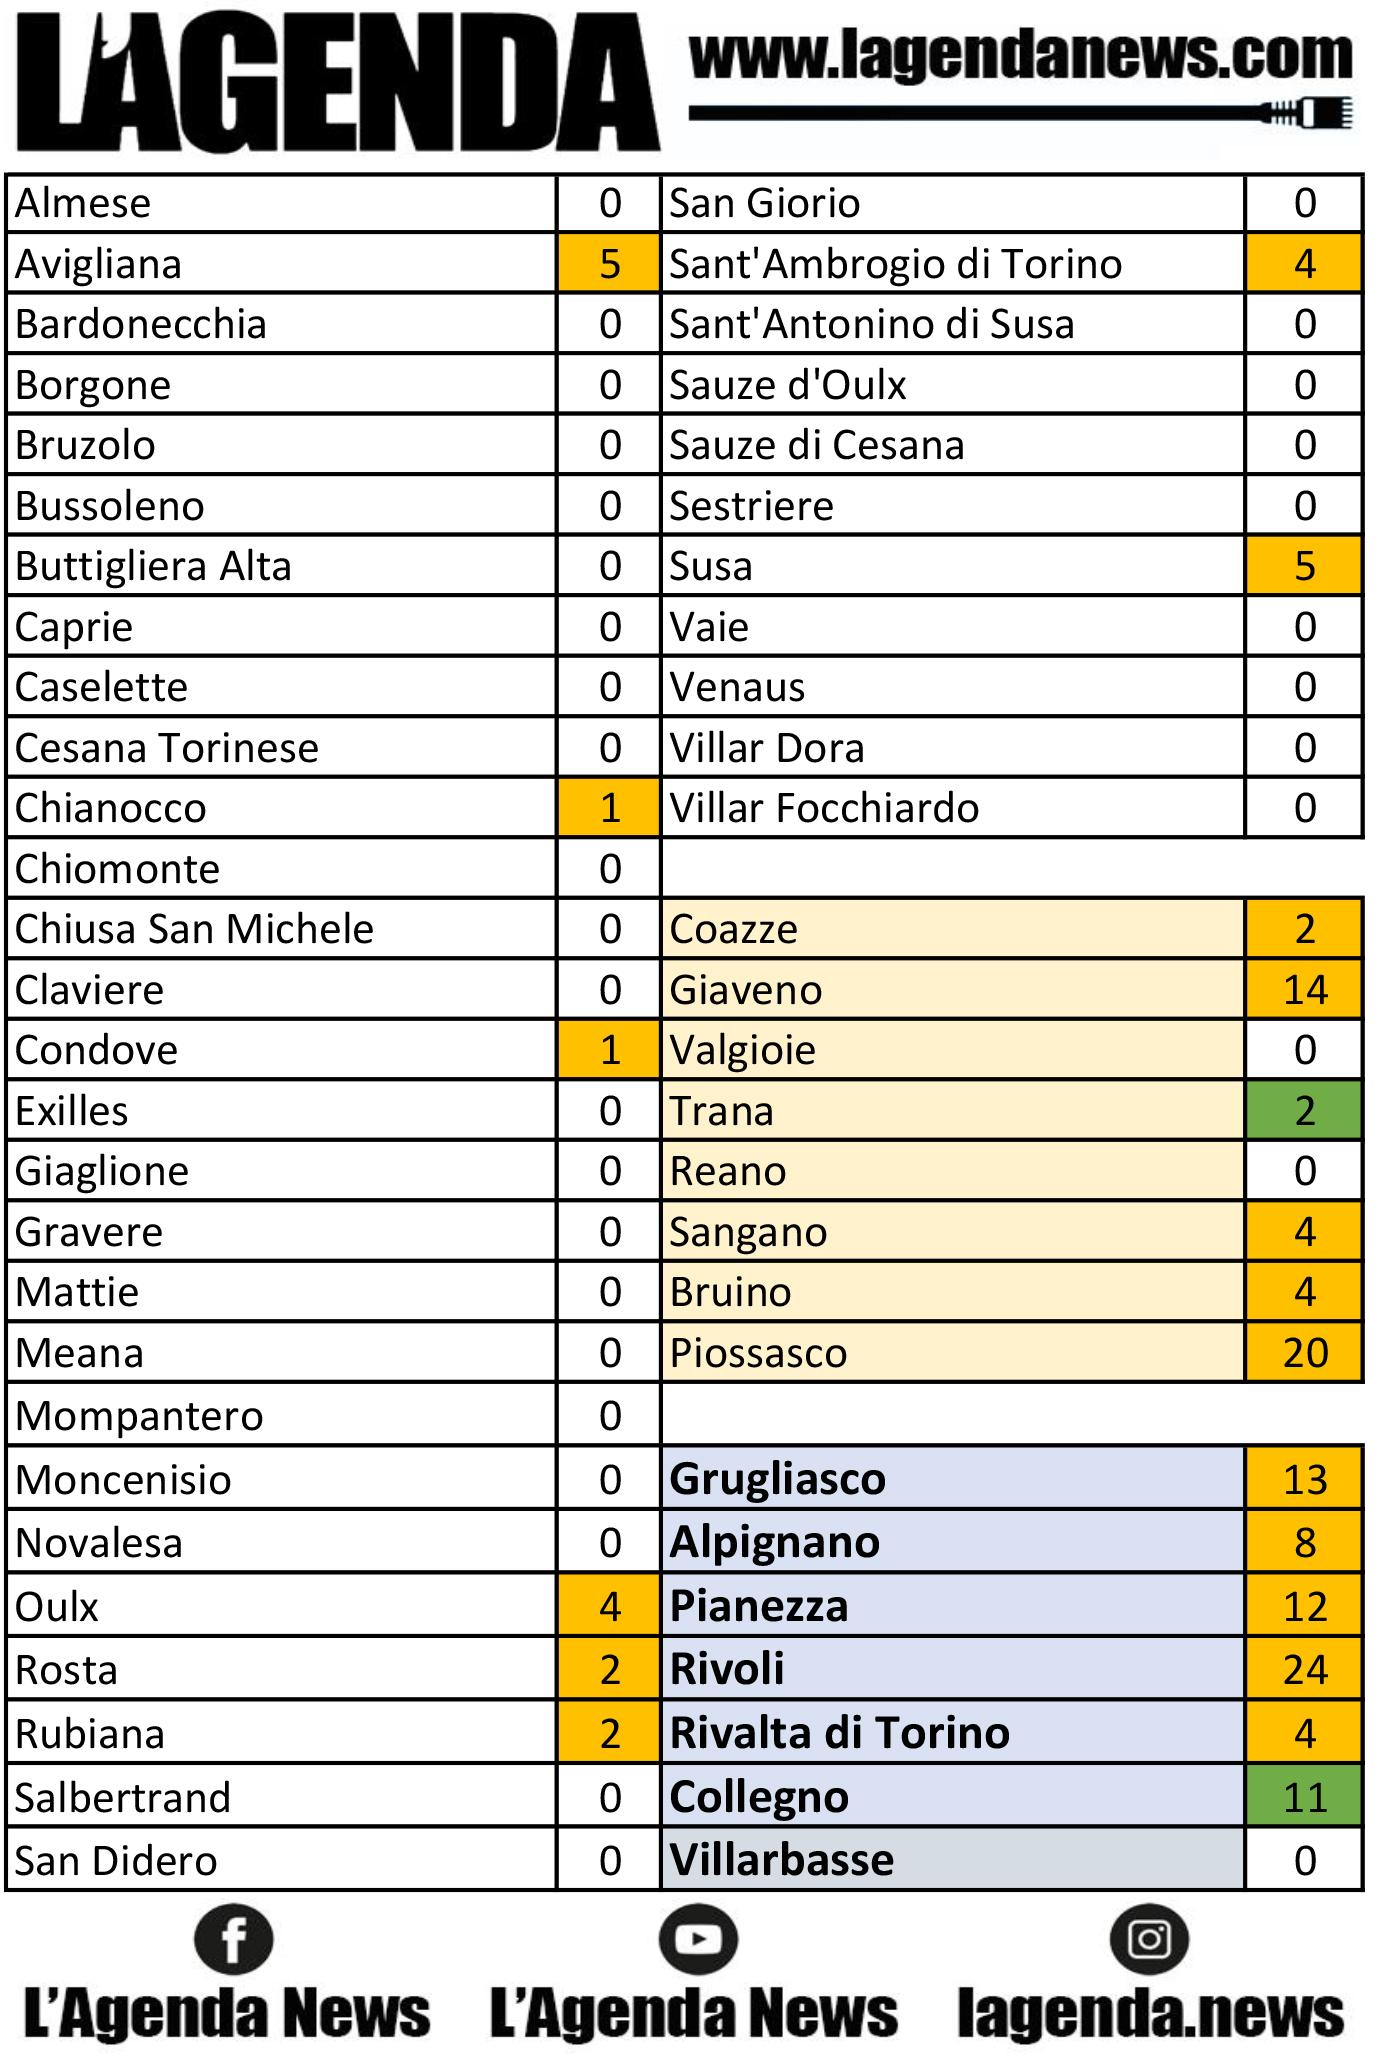 tabella coronavirus 20